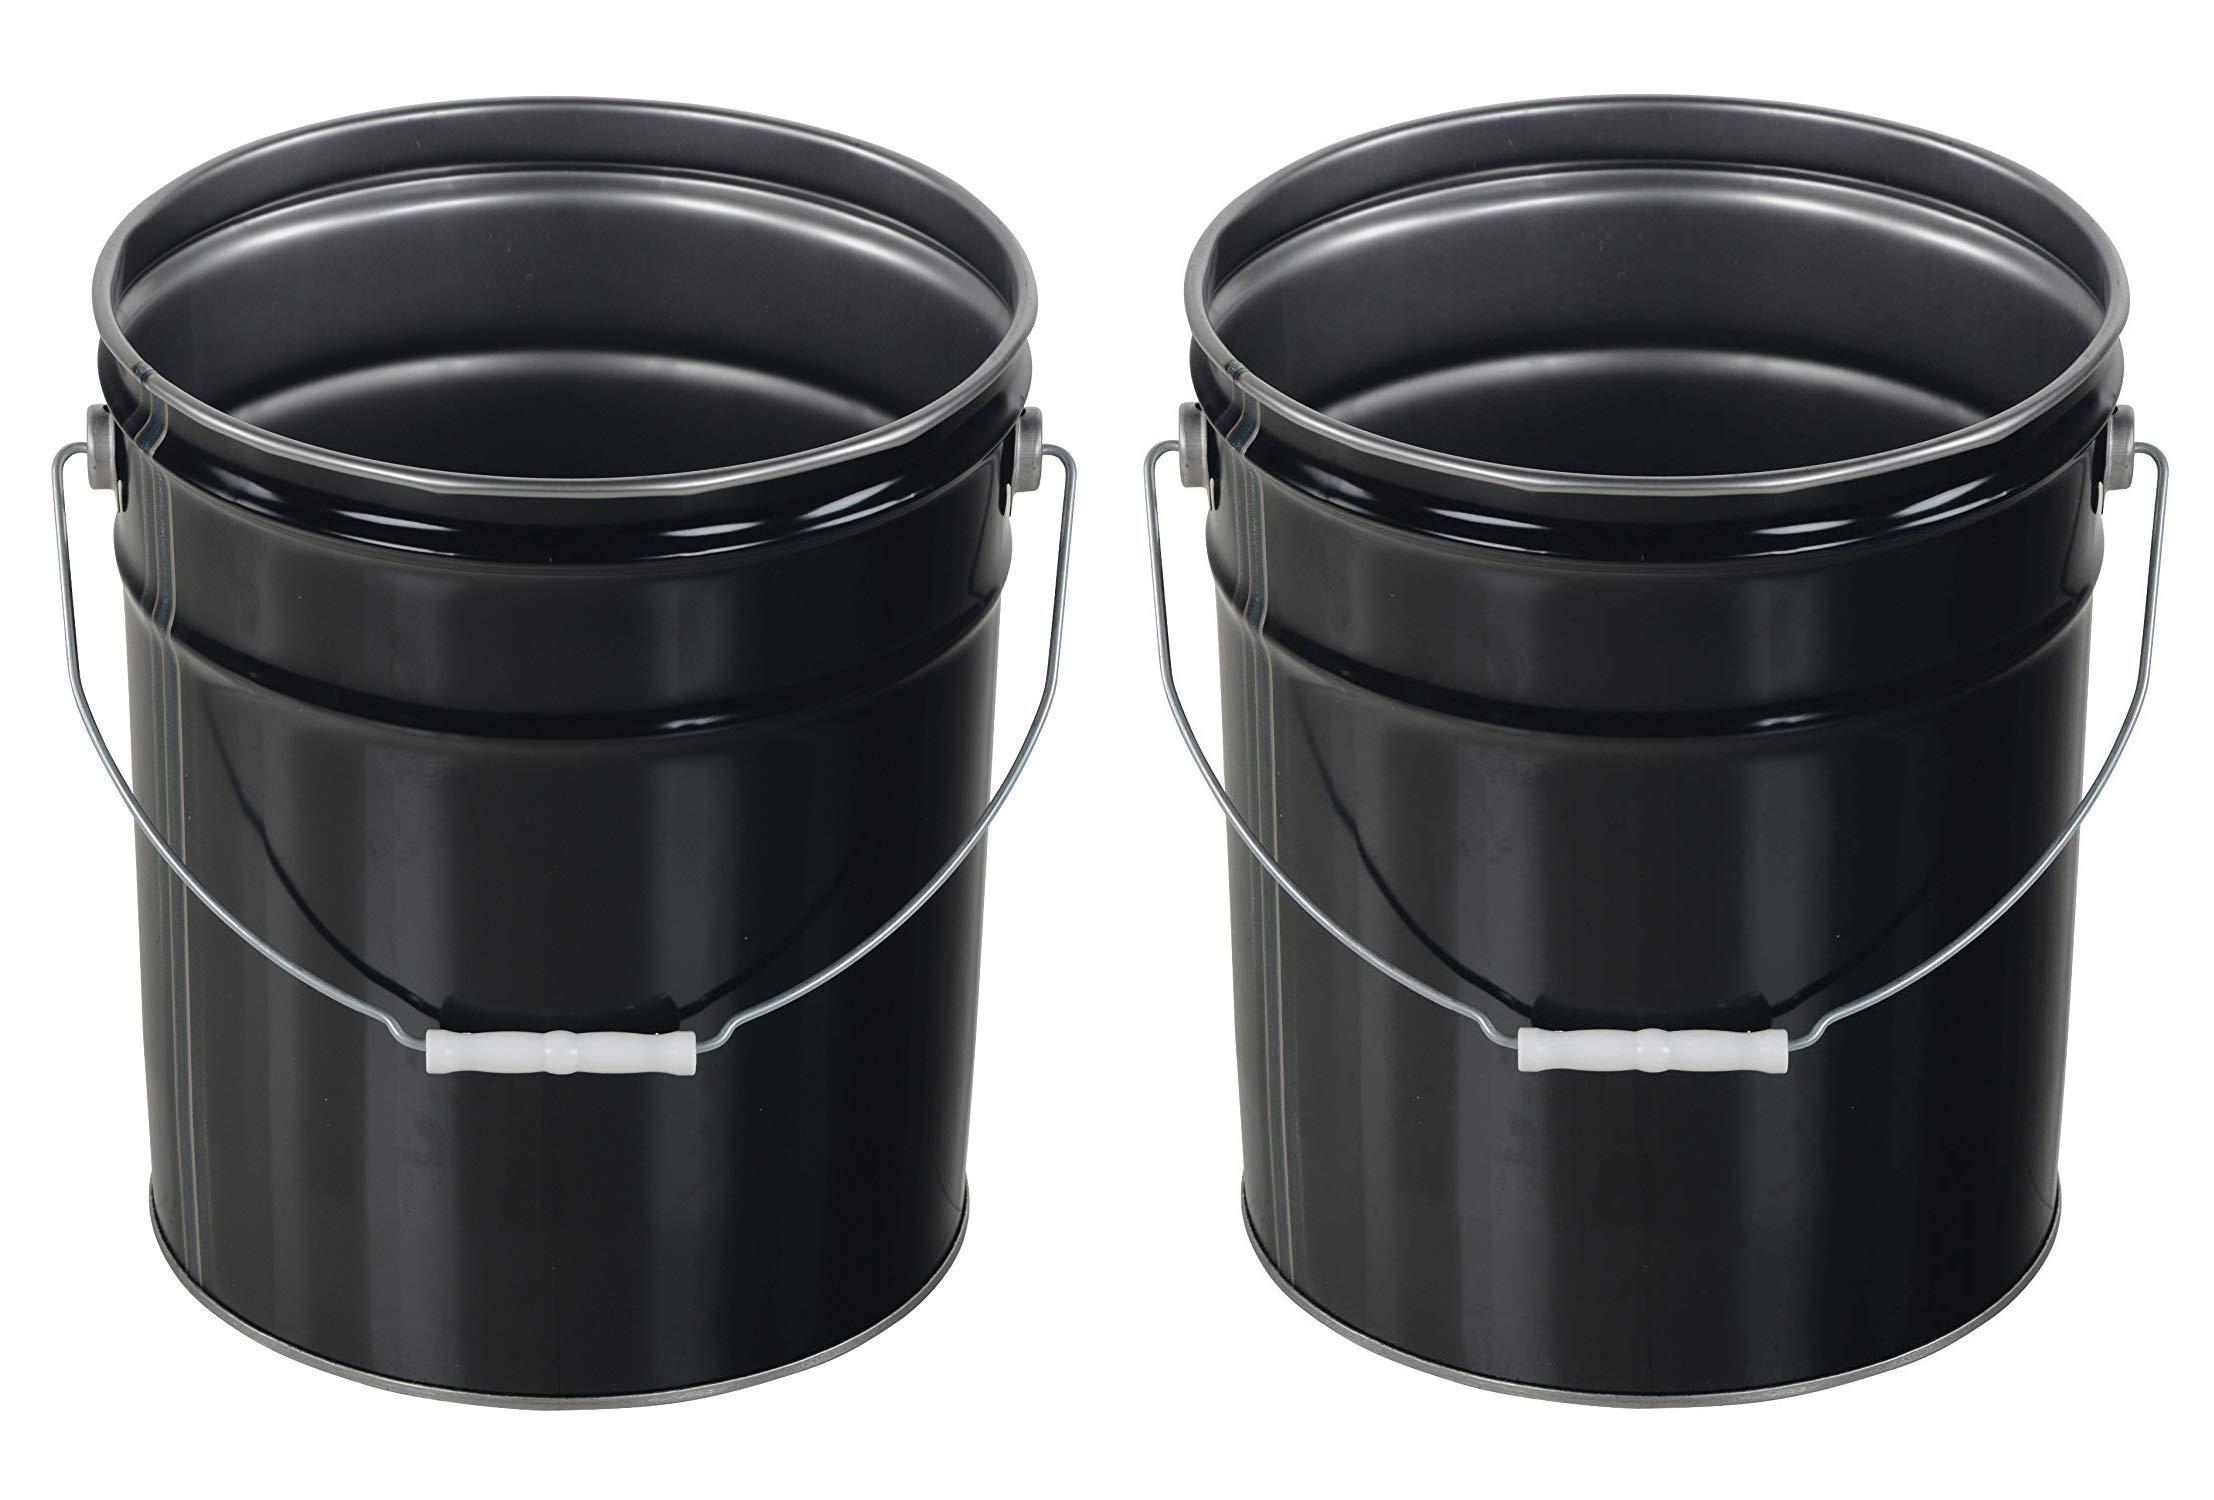 Vestil Pail-STL-RI Steel Open Head Pail with Handle, 5 Gallon Capacity, Black (Pack of 2)